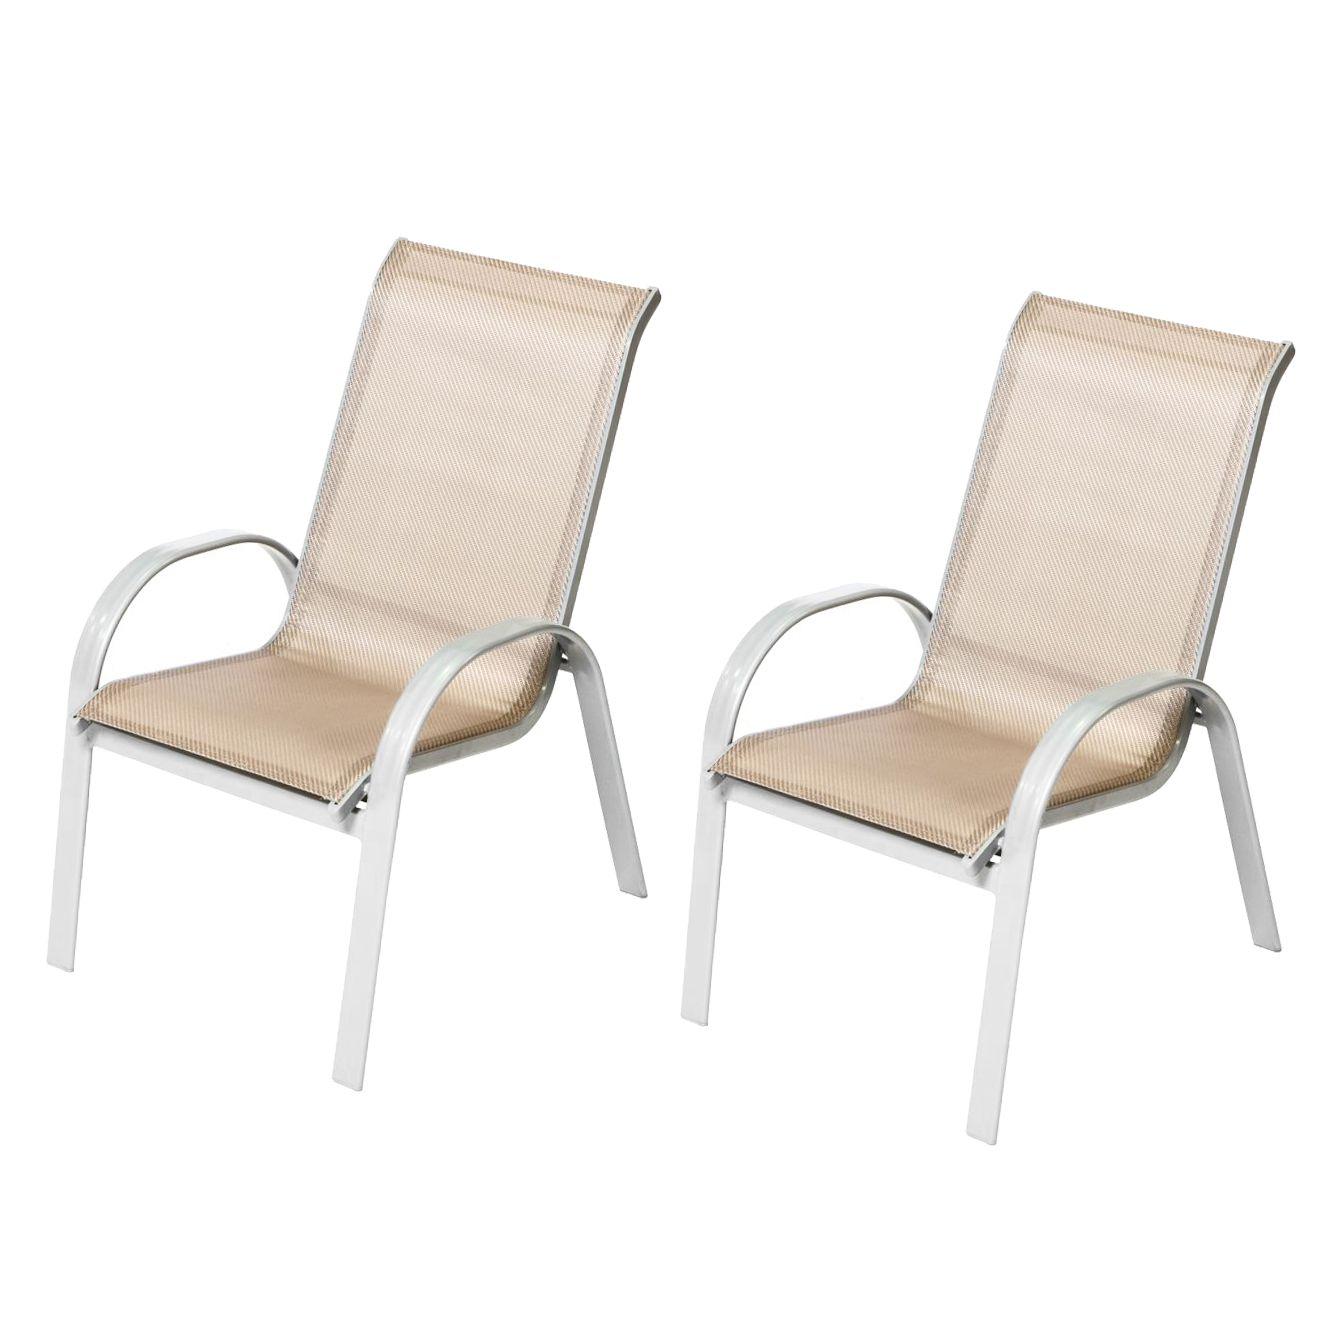 Stapelsessel Amalfi I (2er Set)   Aluminium / Textilene, Merxx Jetzt  Bestellen Unter: Https://moebel.ladendirekt.de/garten/gartenmoebel/gartenstuehle/?uidu003d  ...